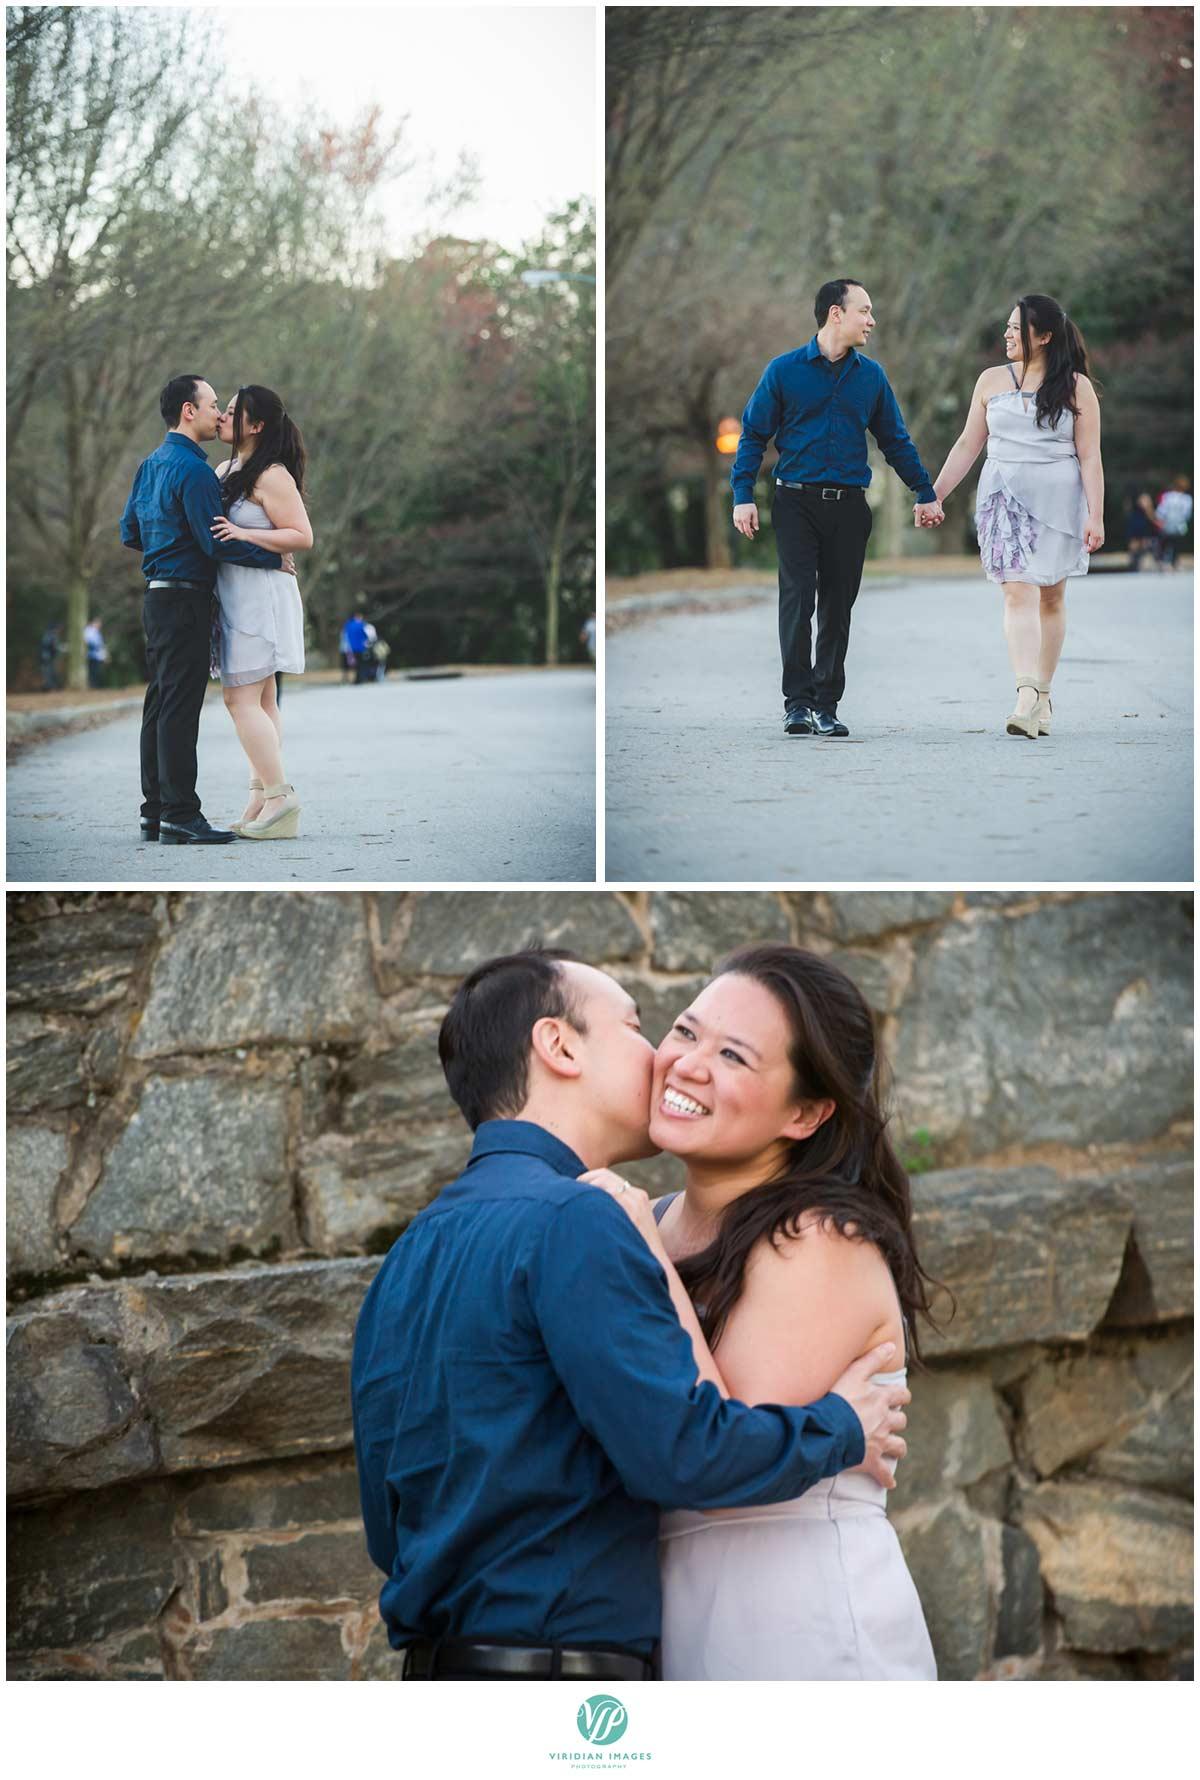 Atlanta_Piedmont_Park_engagement_session_Viridian_Images_Photography_photo-9